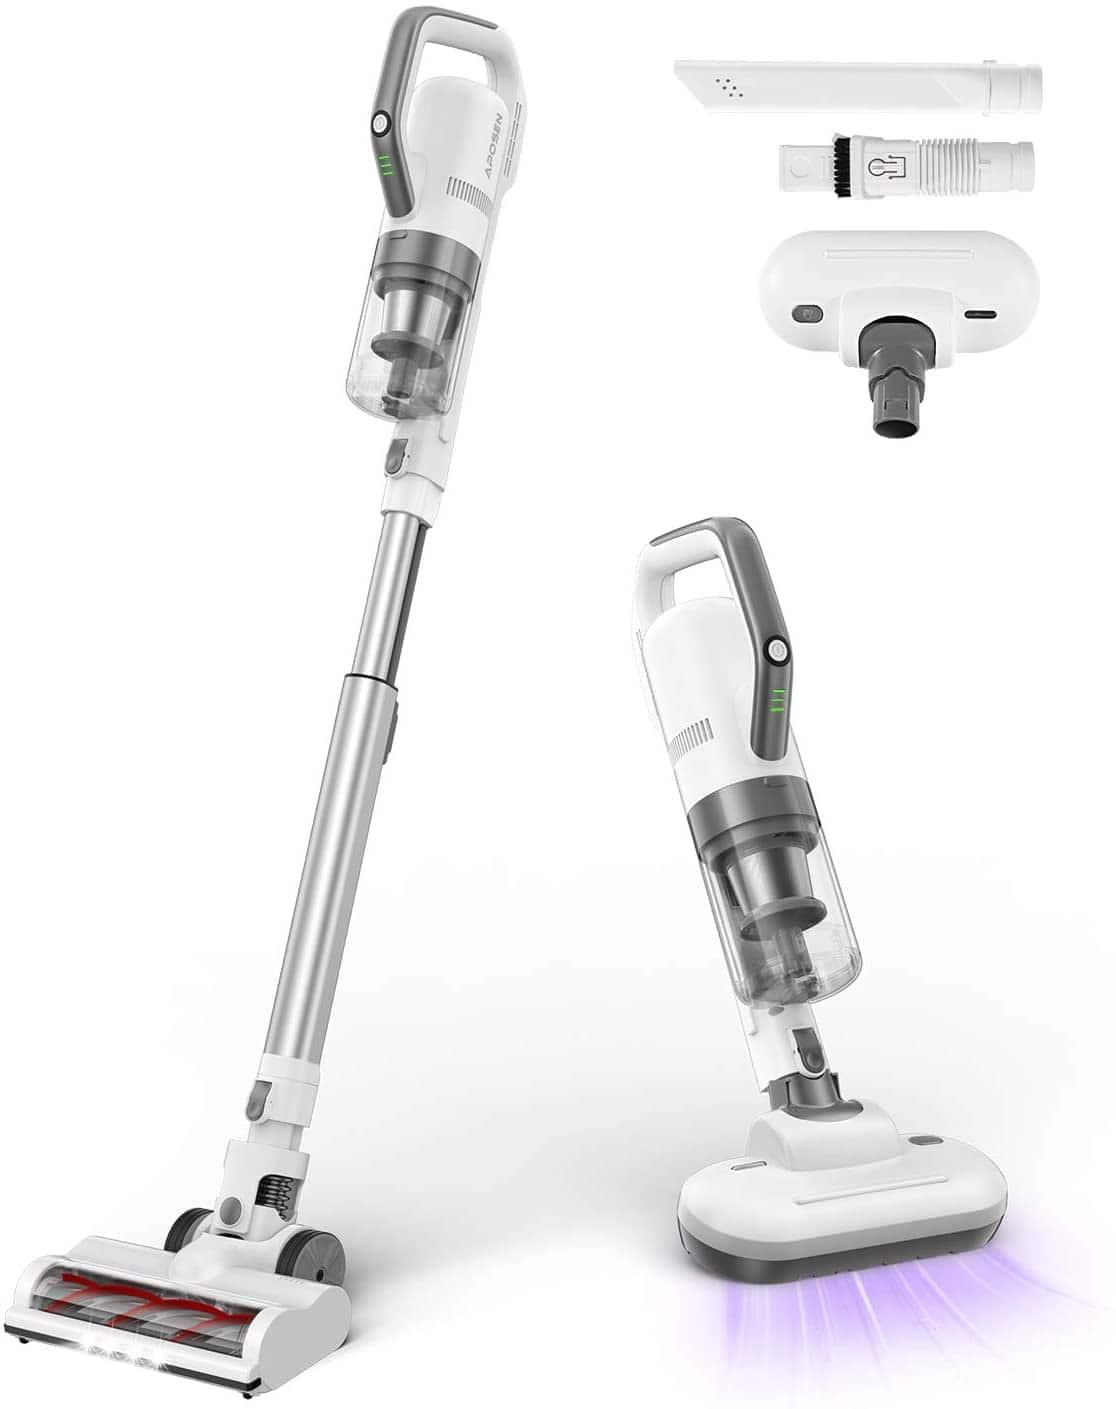 APOSEN 4 in 1 Cordless Stick Vacuum Cleaner w/ Brushless Motor